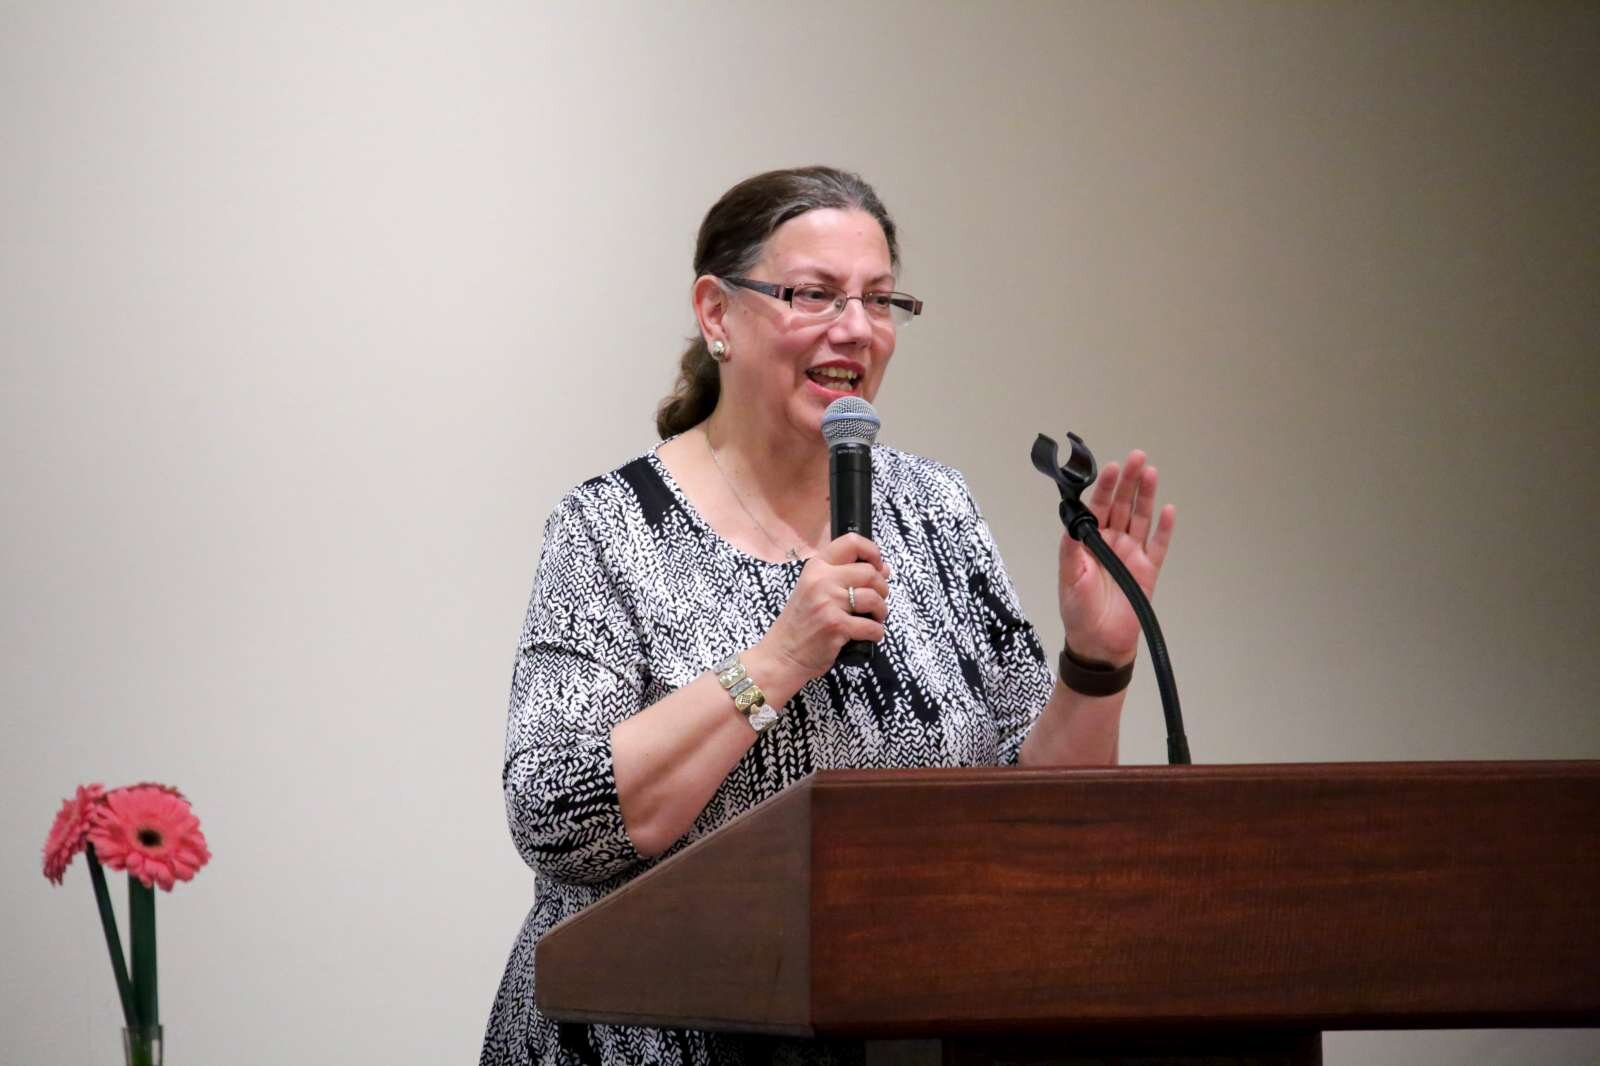 Panelist representing the Jewish faith Ms. Rhonda Williams